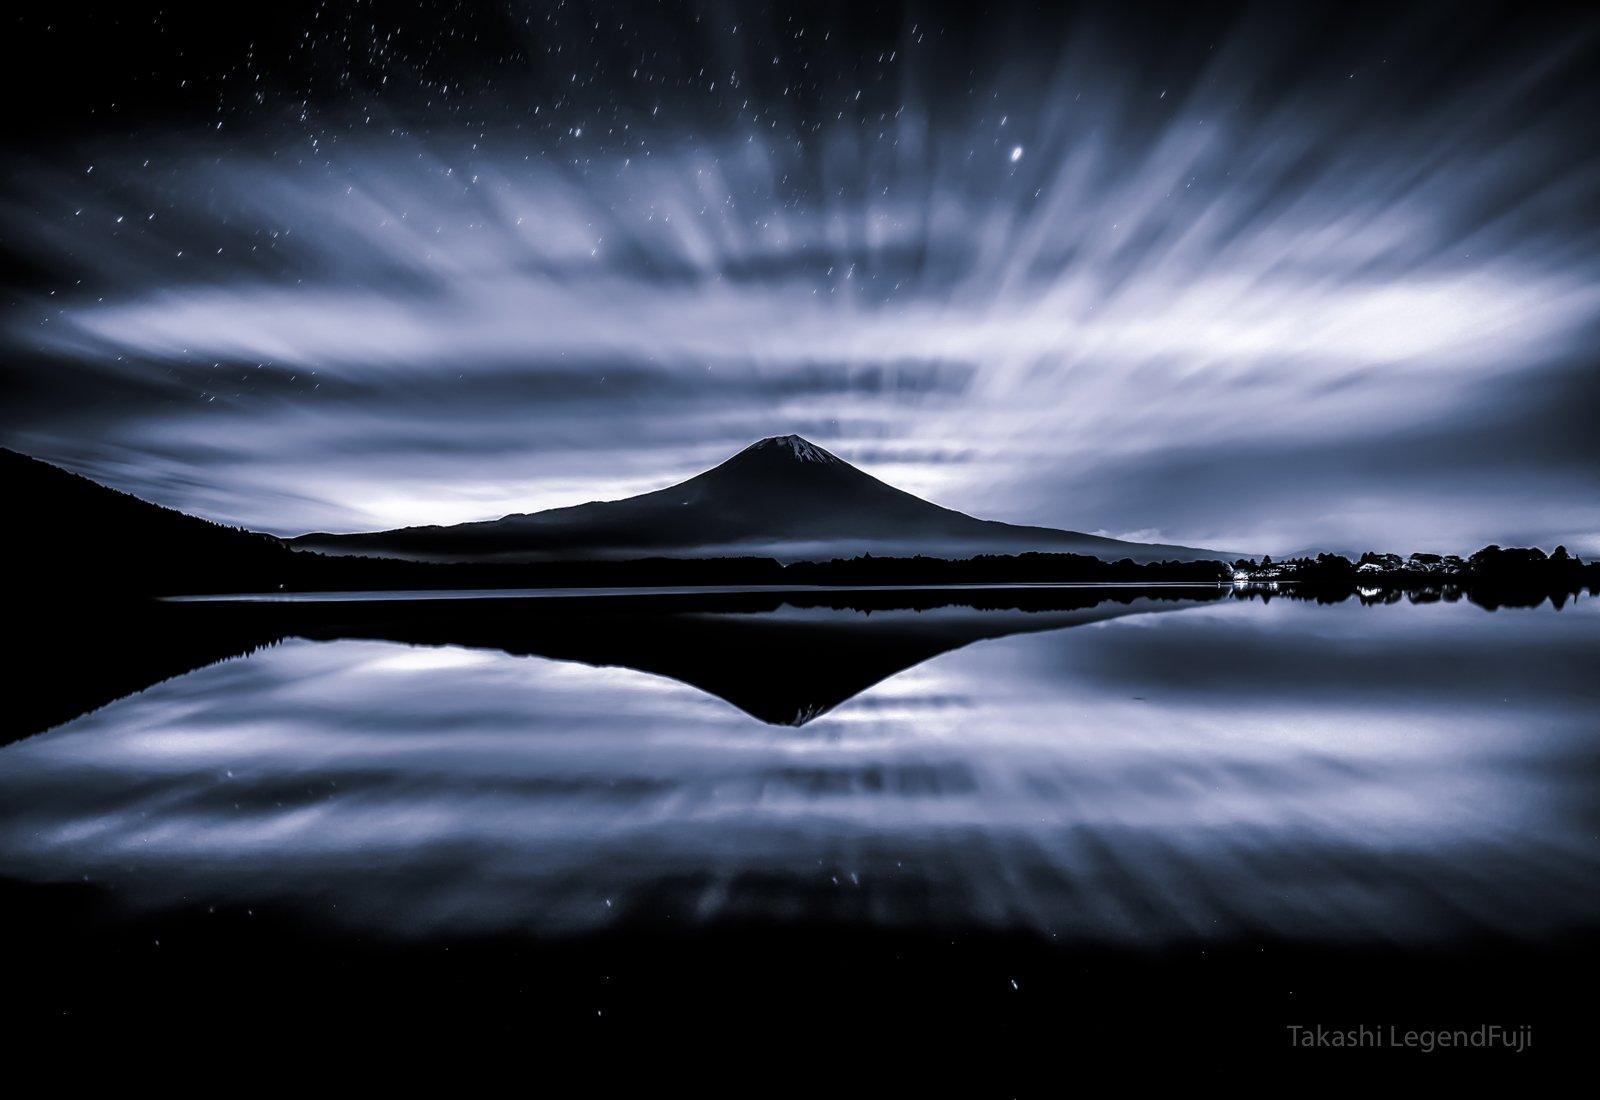 Fuji,mountain,Japan,lake,reflection,cloud,star,night,calm,beautiful,landscapes,, Takashi